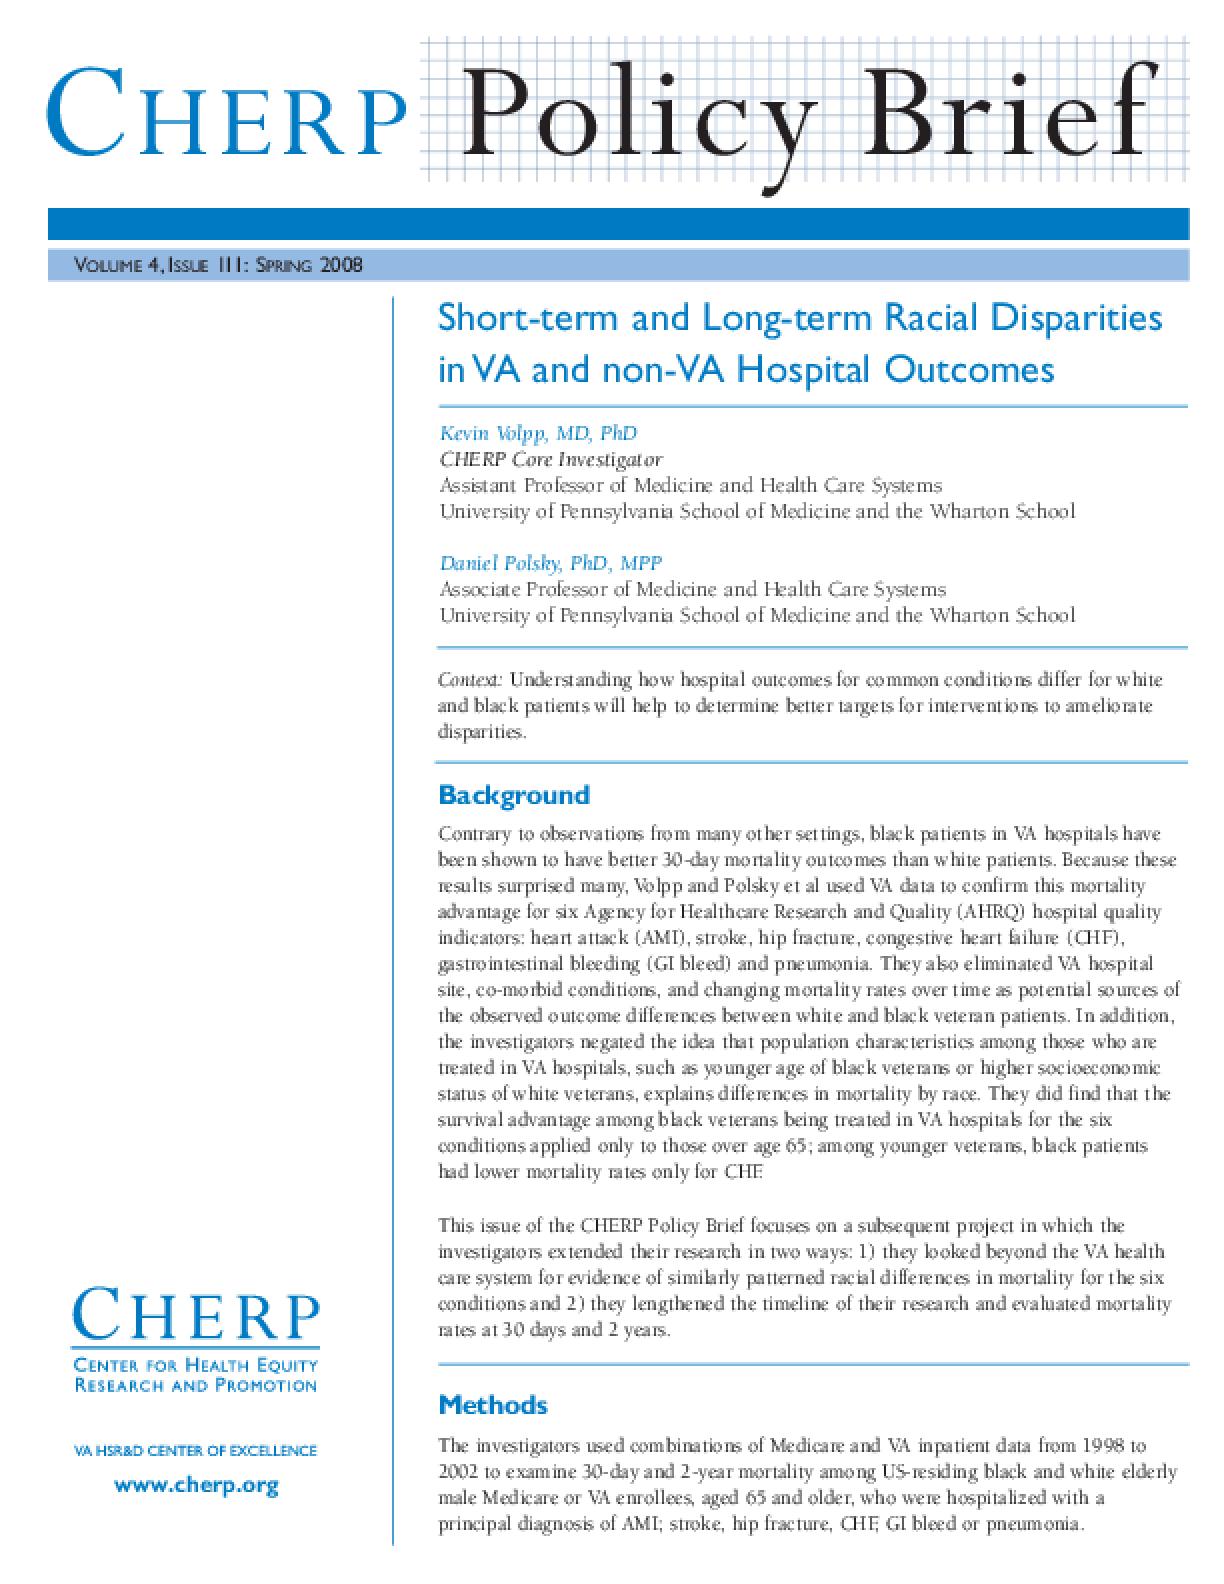 Short-term and Long-term Racial Disparities in VA and non-VA Hospital Outcomes